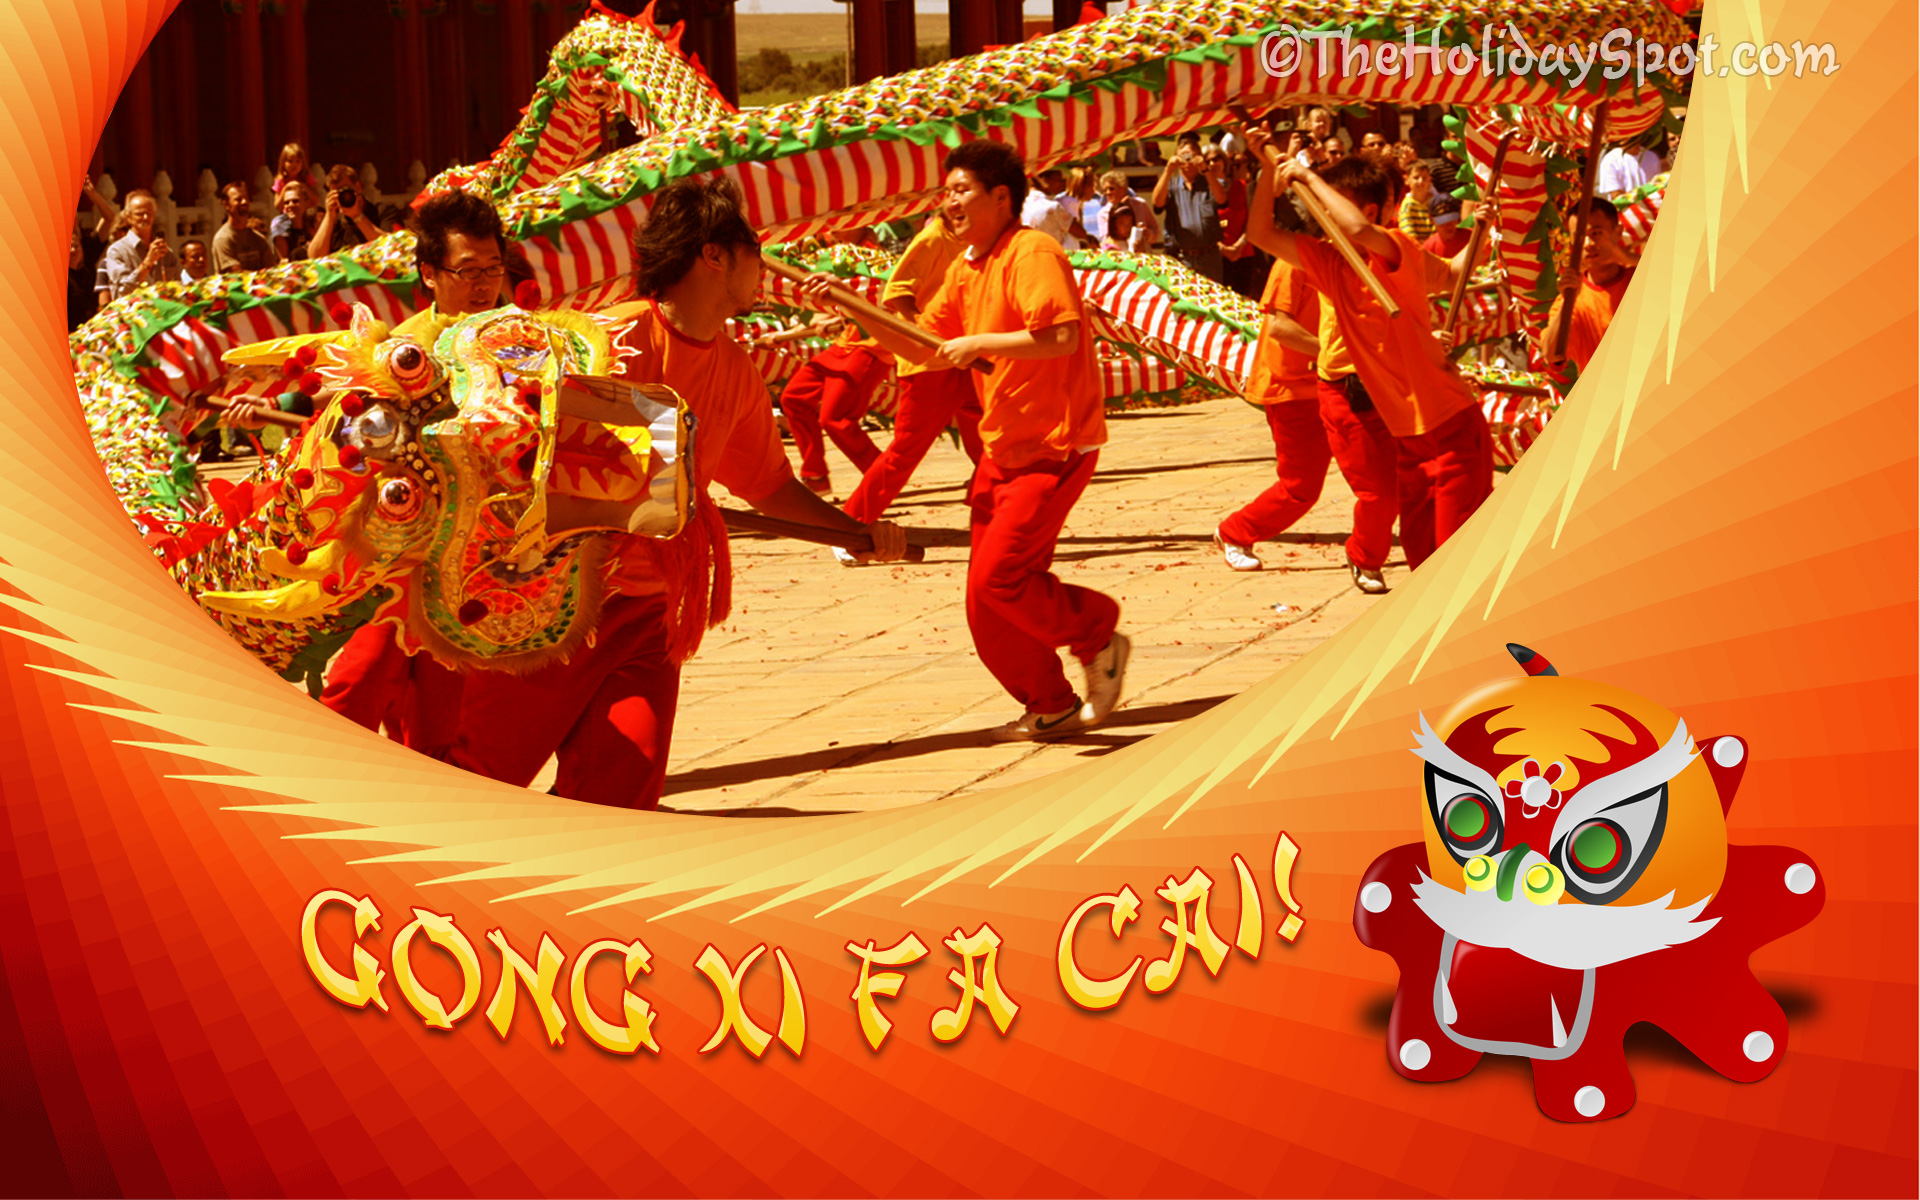 chinese new year wallpaper gong xi fa cai